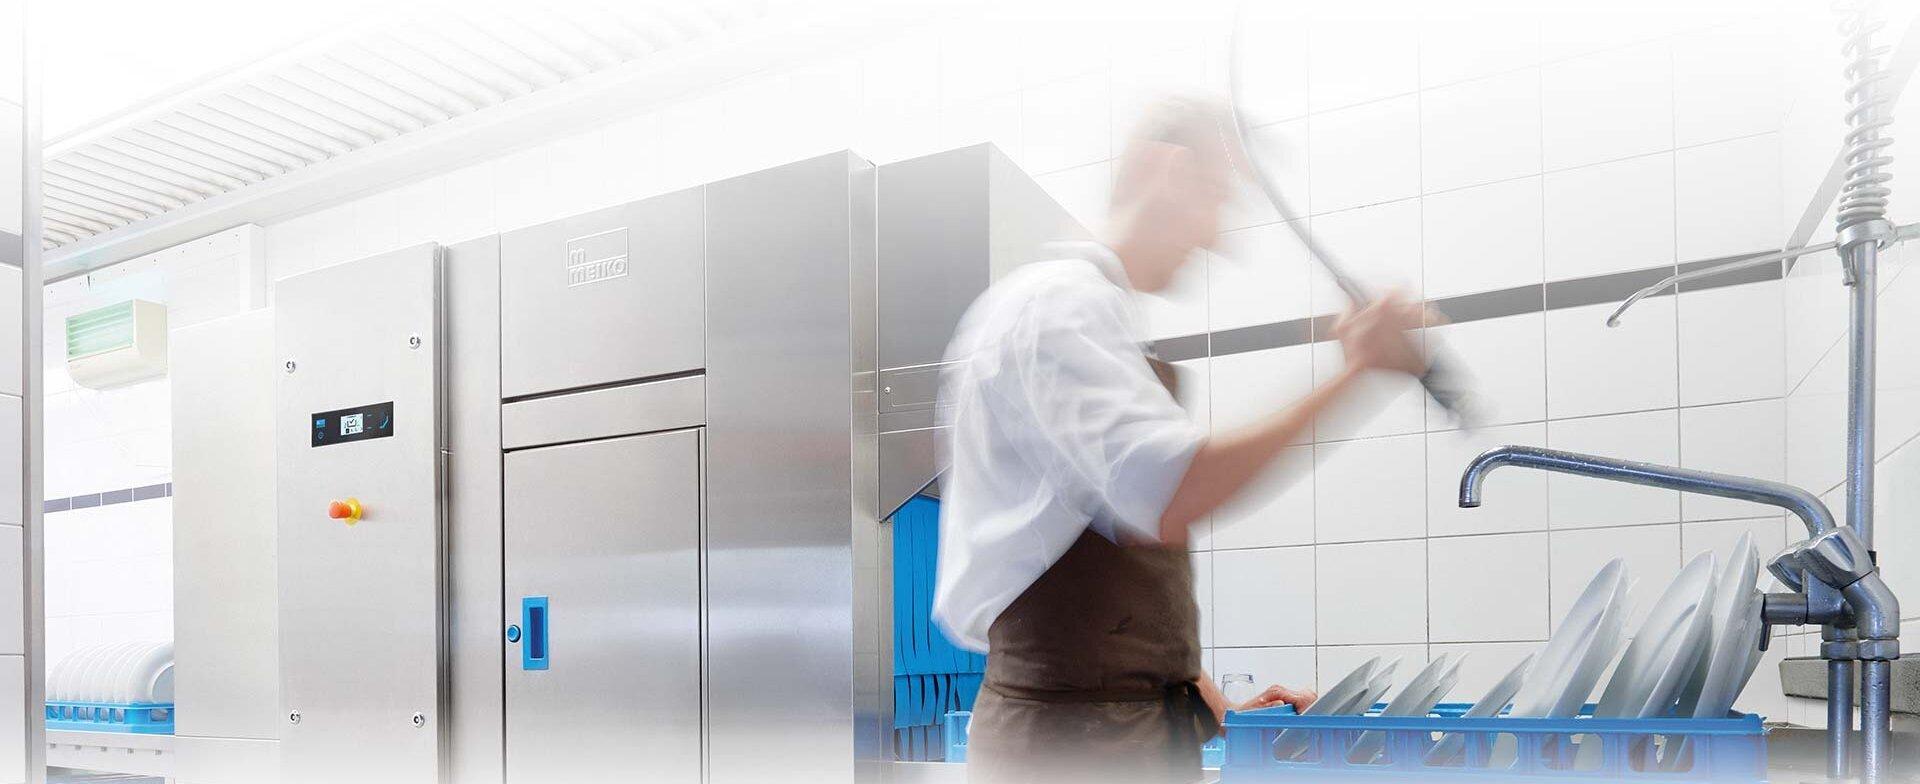 The UPster K dishwasher